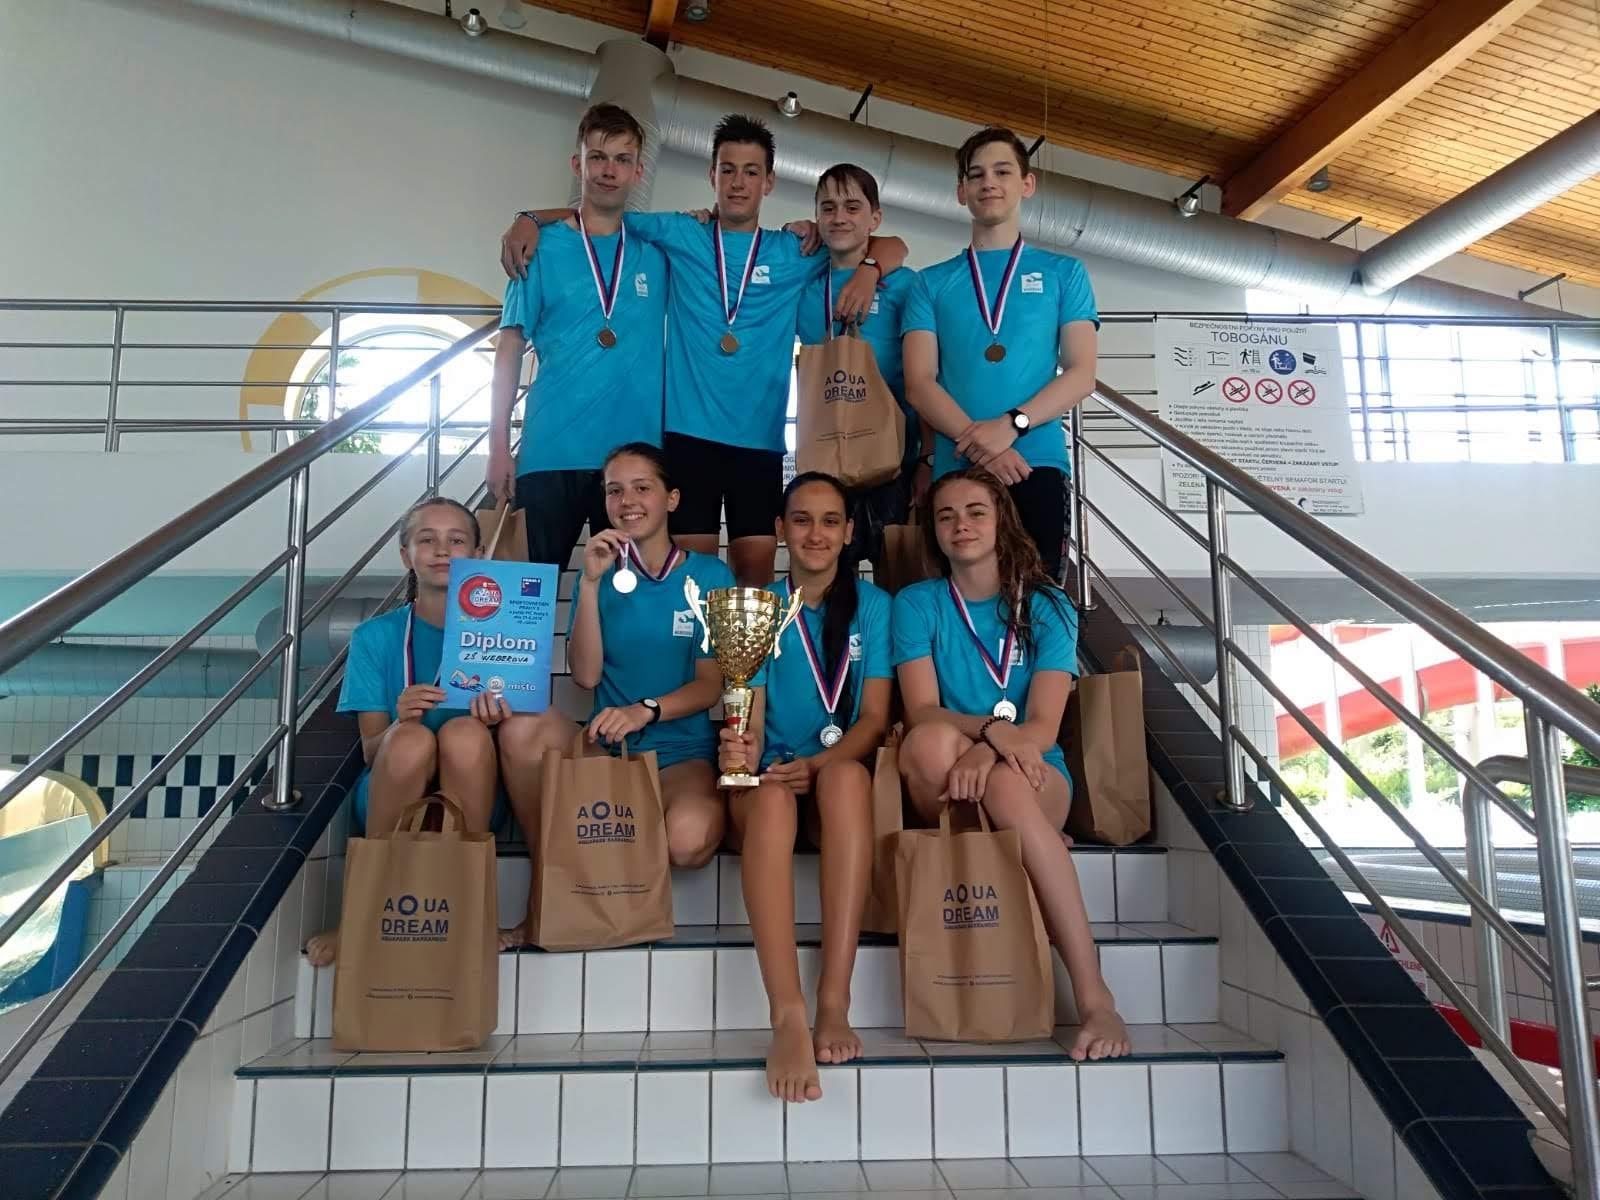 sportovni-uspechy-zs-weberova-2019